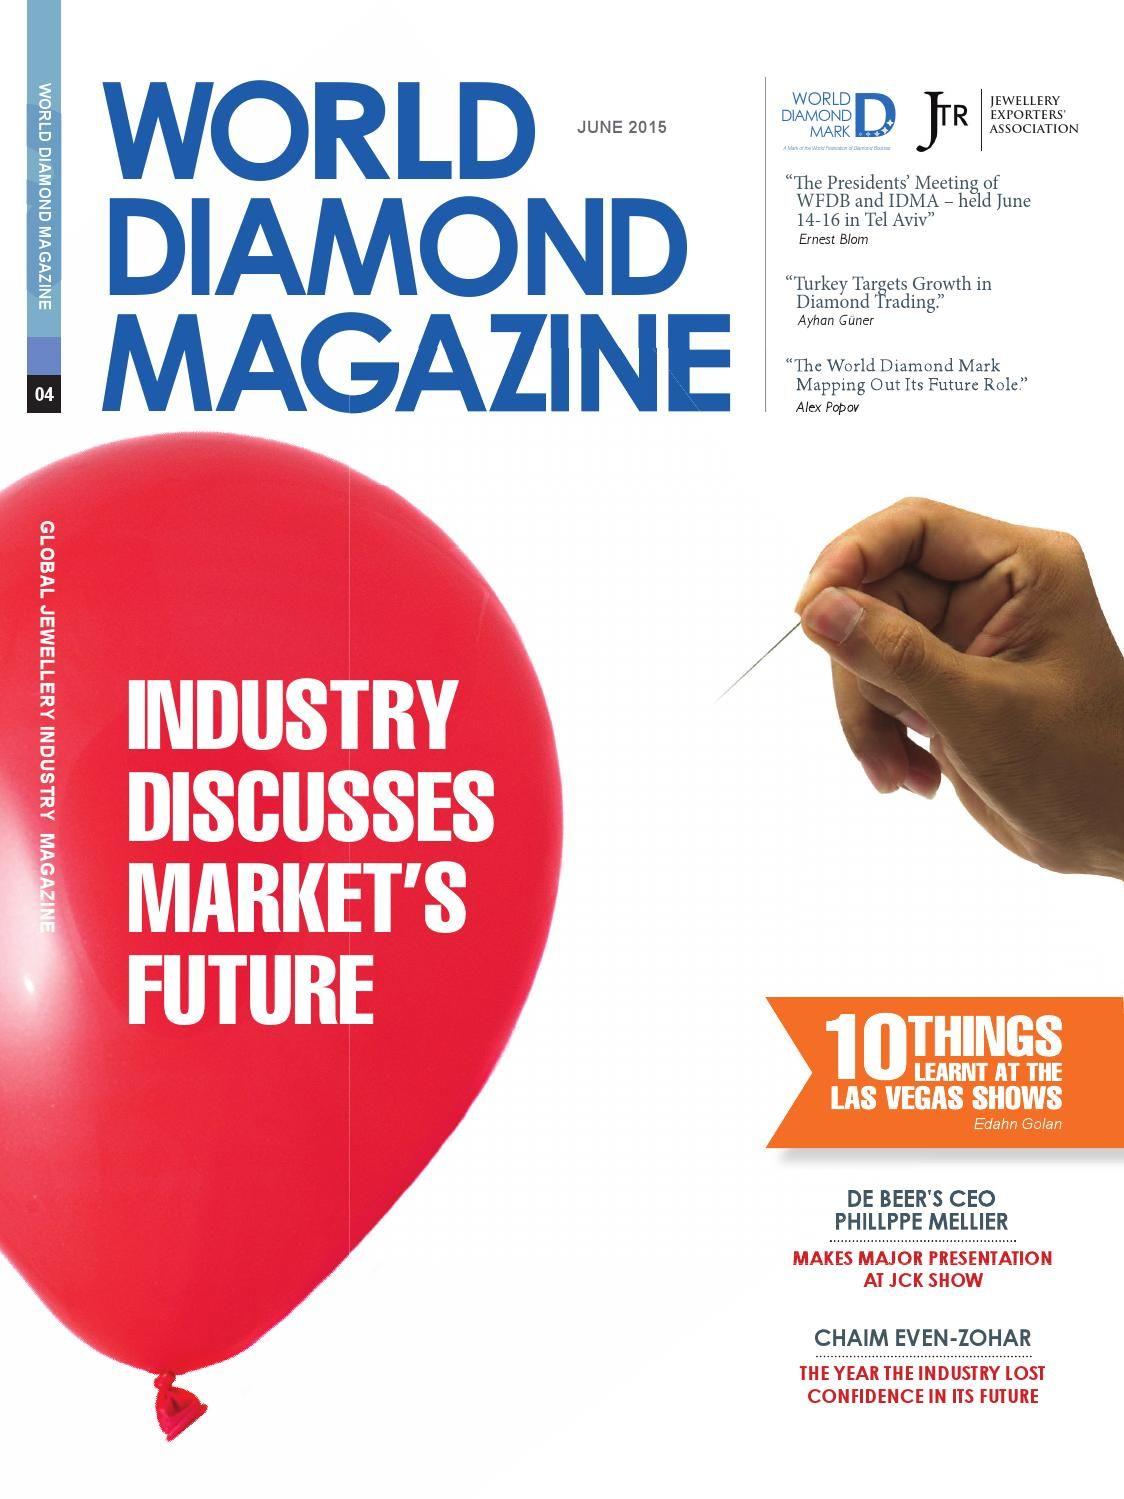 World Diamond Magazine 4